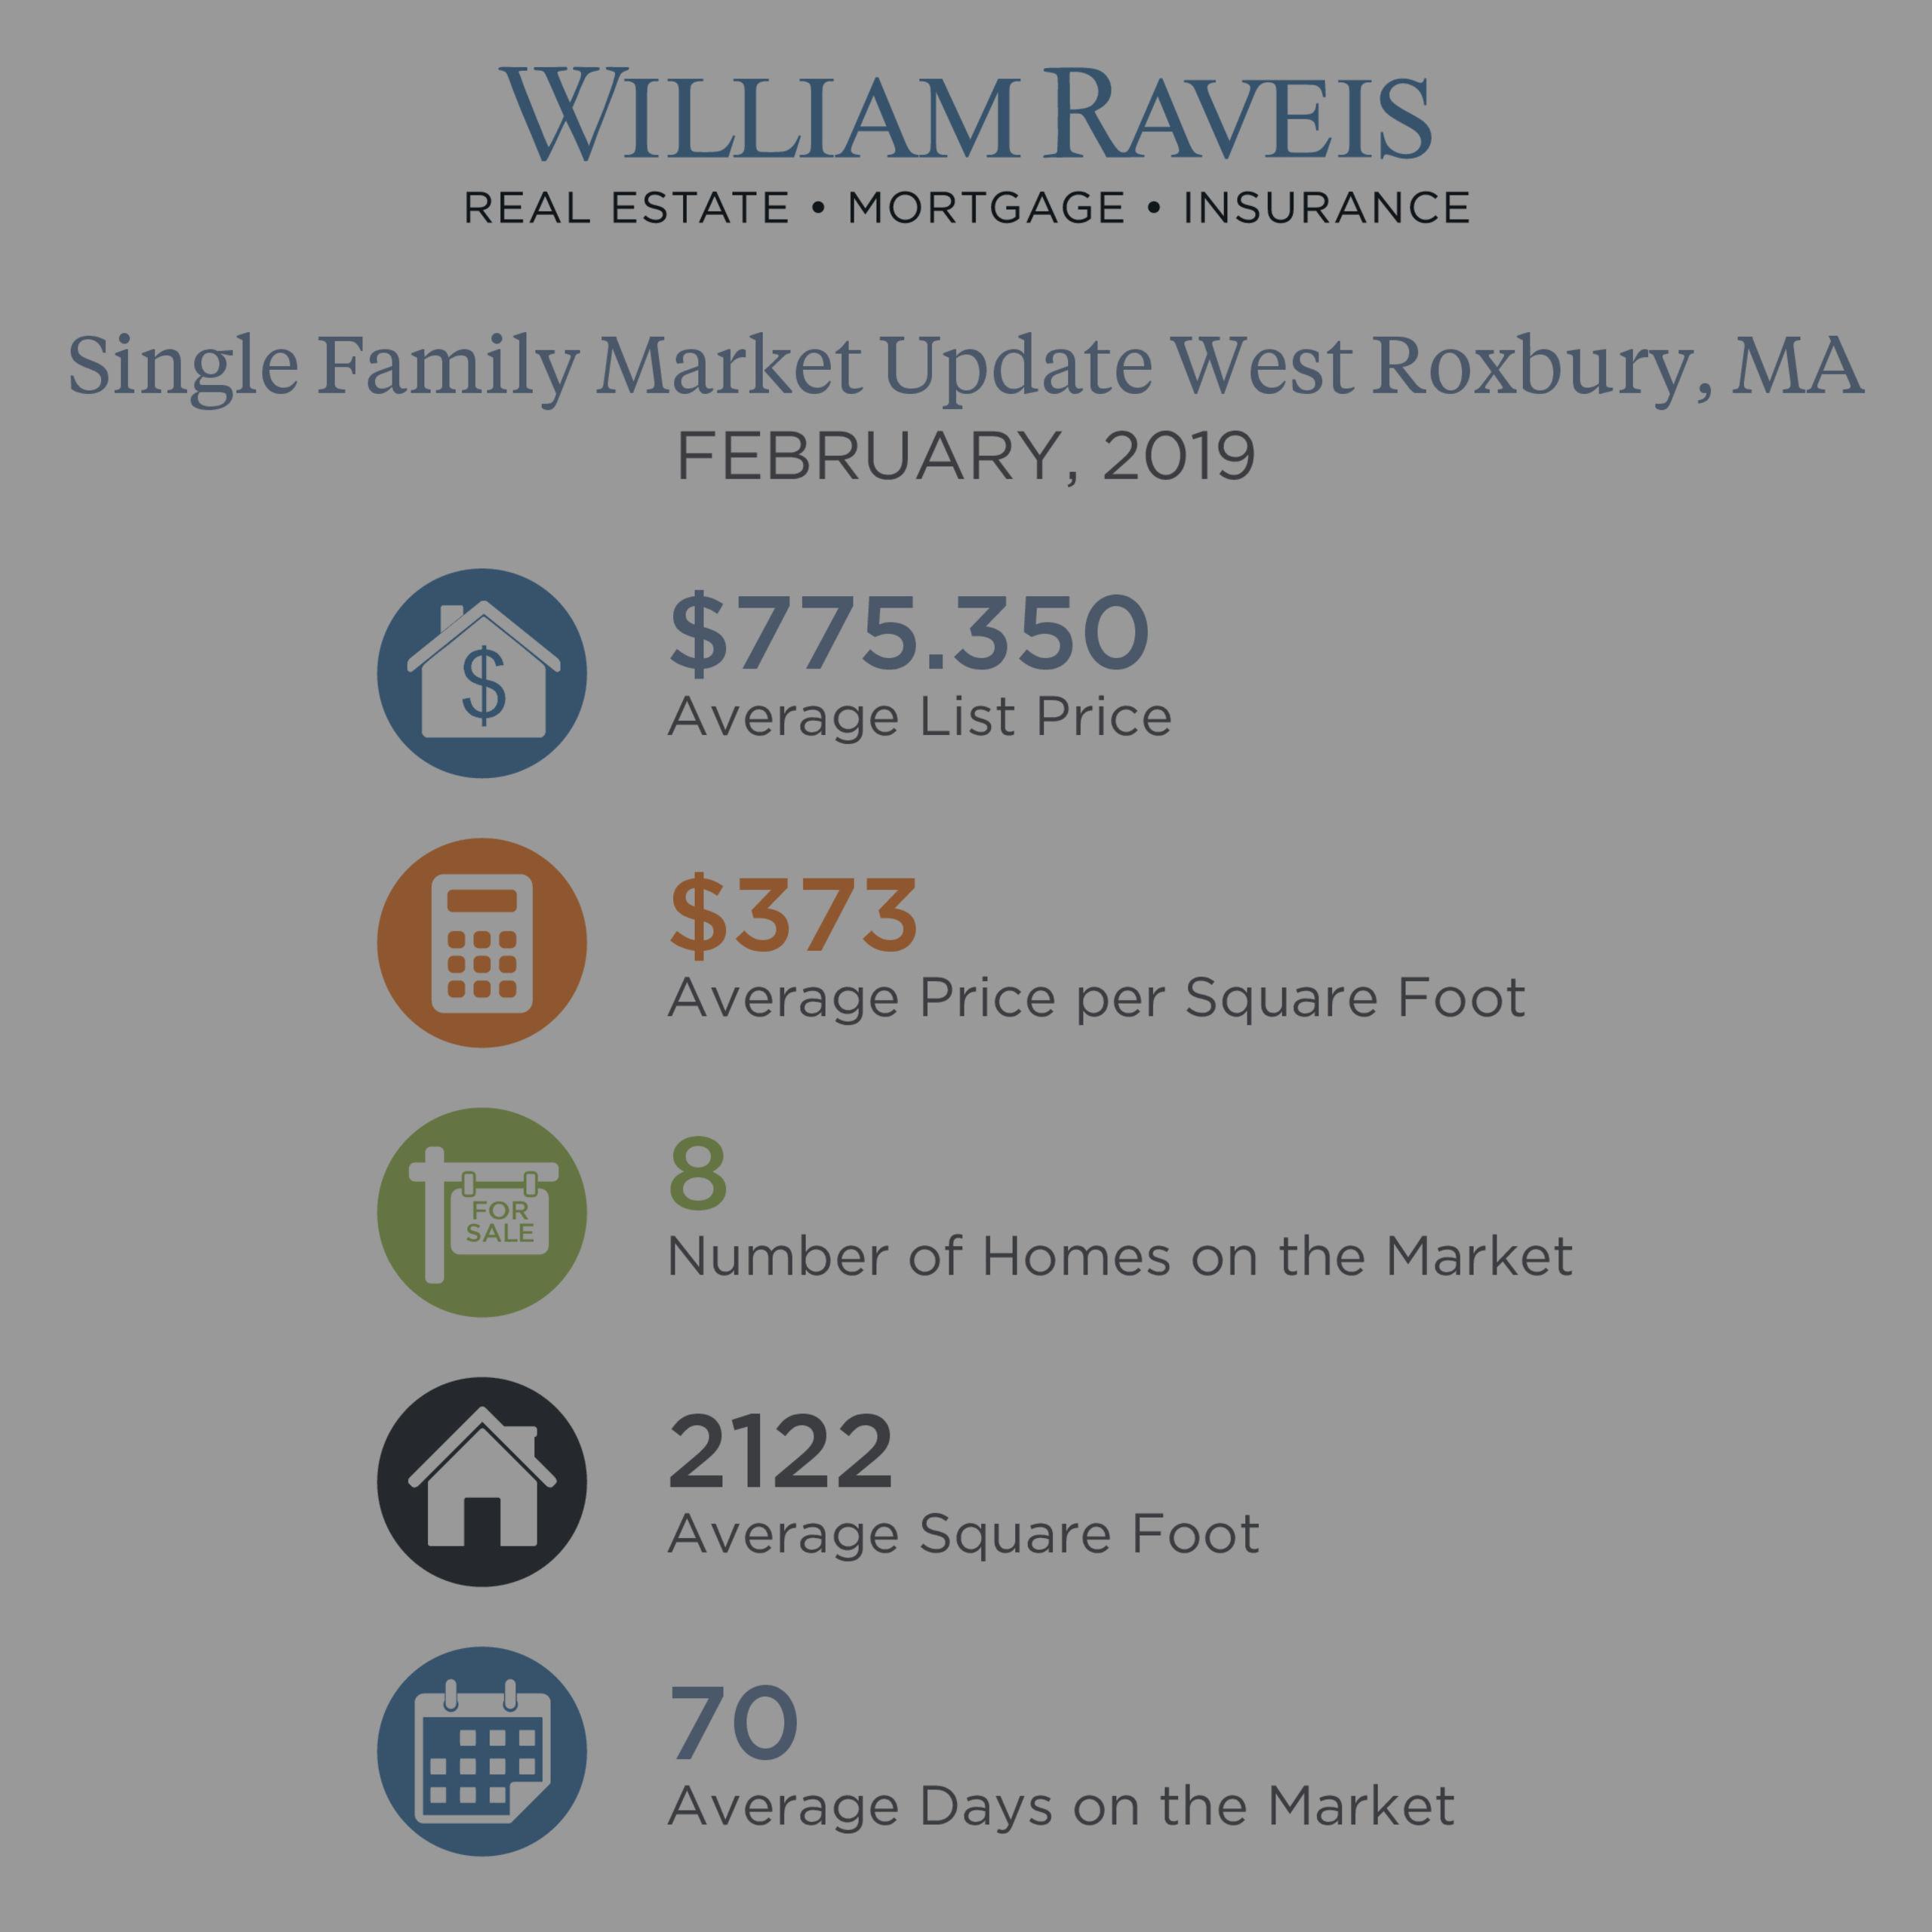 West Roxbury Single Family & Condominium Housing Market Update February 2019